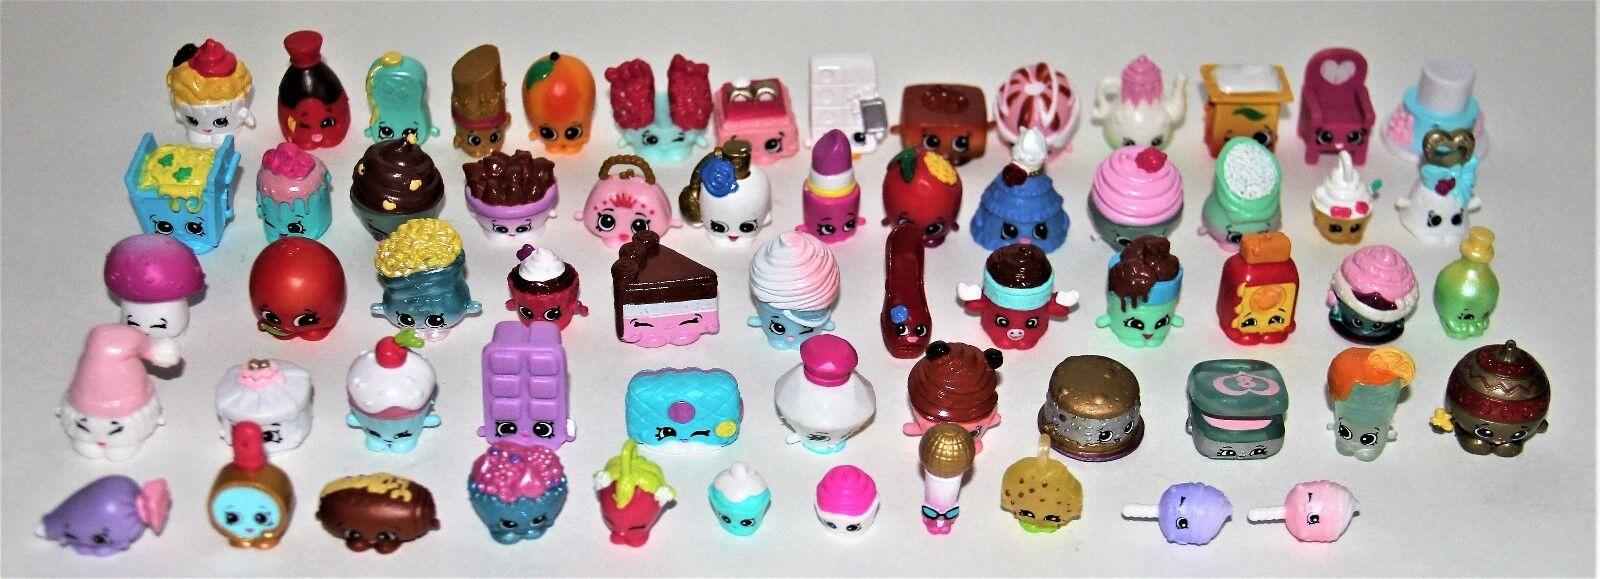 Shopkins Figurines Lot of 60 Various Sizes colors Faces